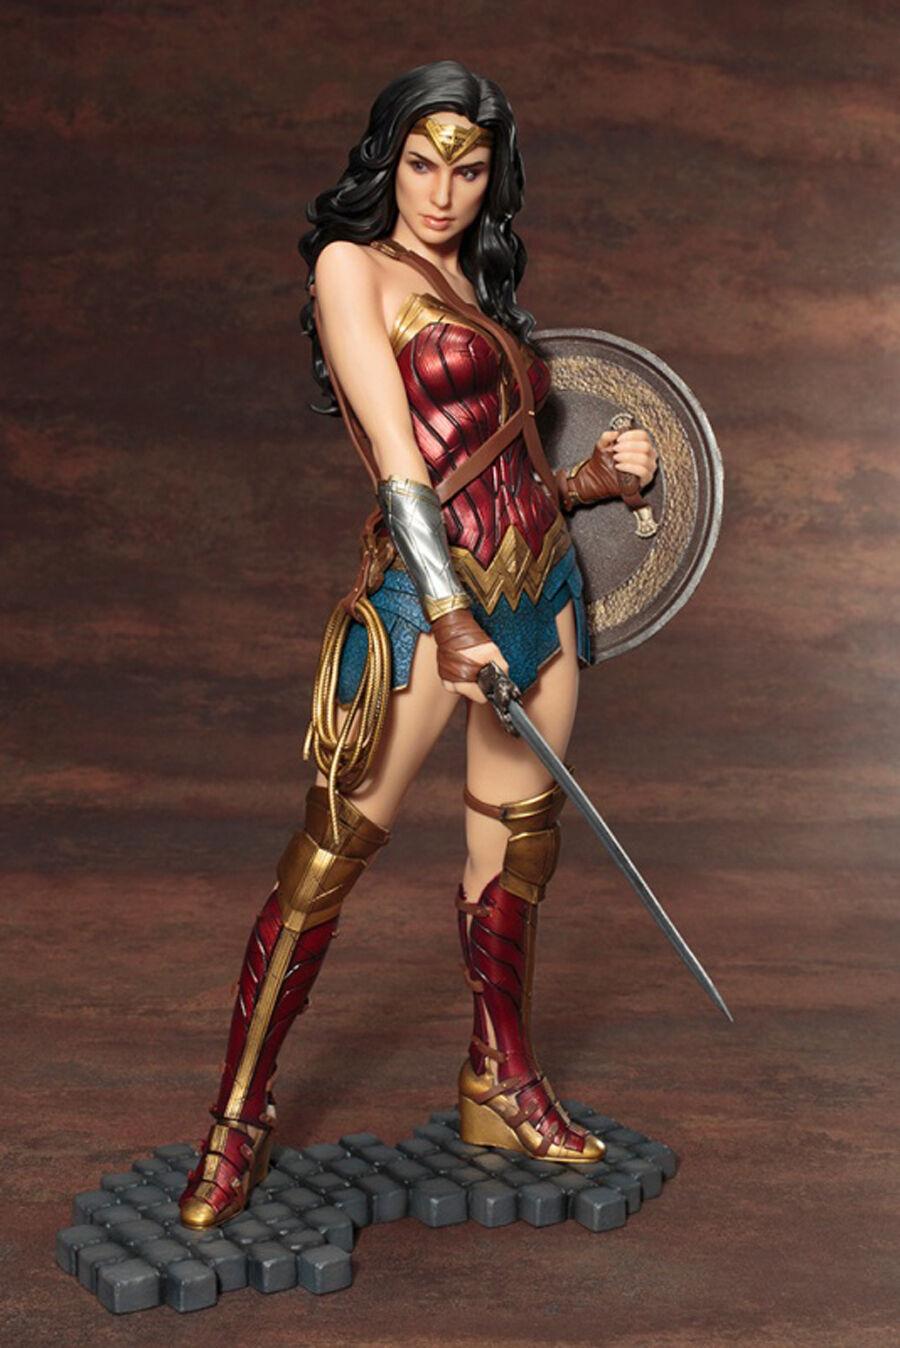 Wonder woman 2017 prinzessin diana abbildung modell harz kit unlackiert unassemble 1   6